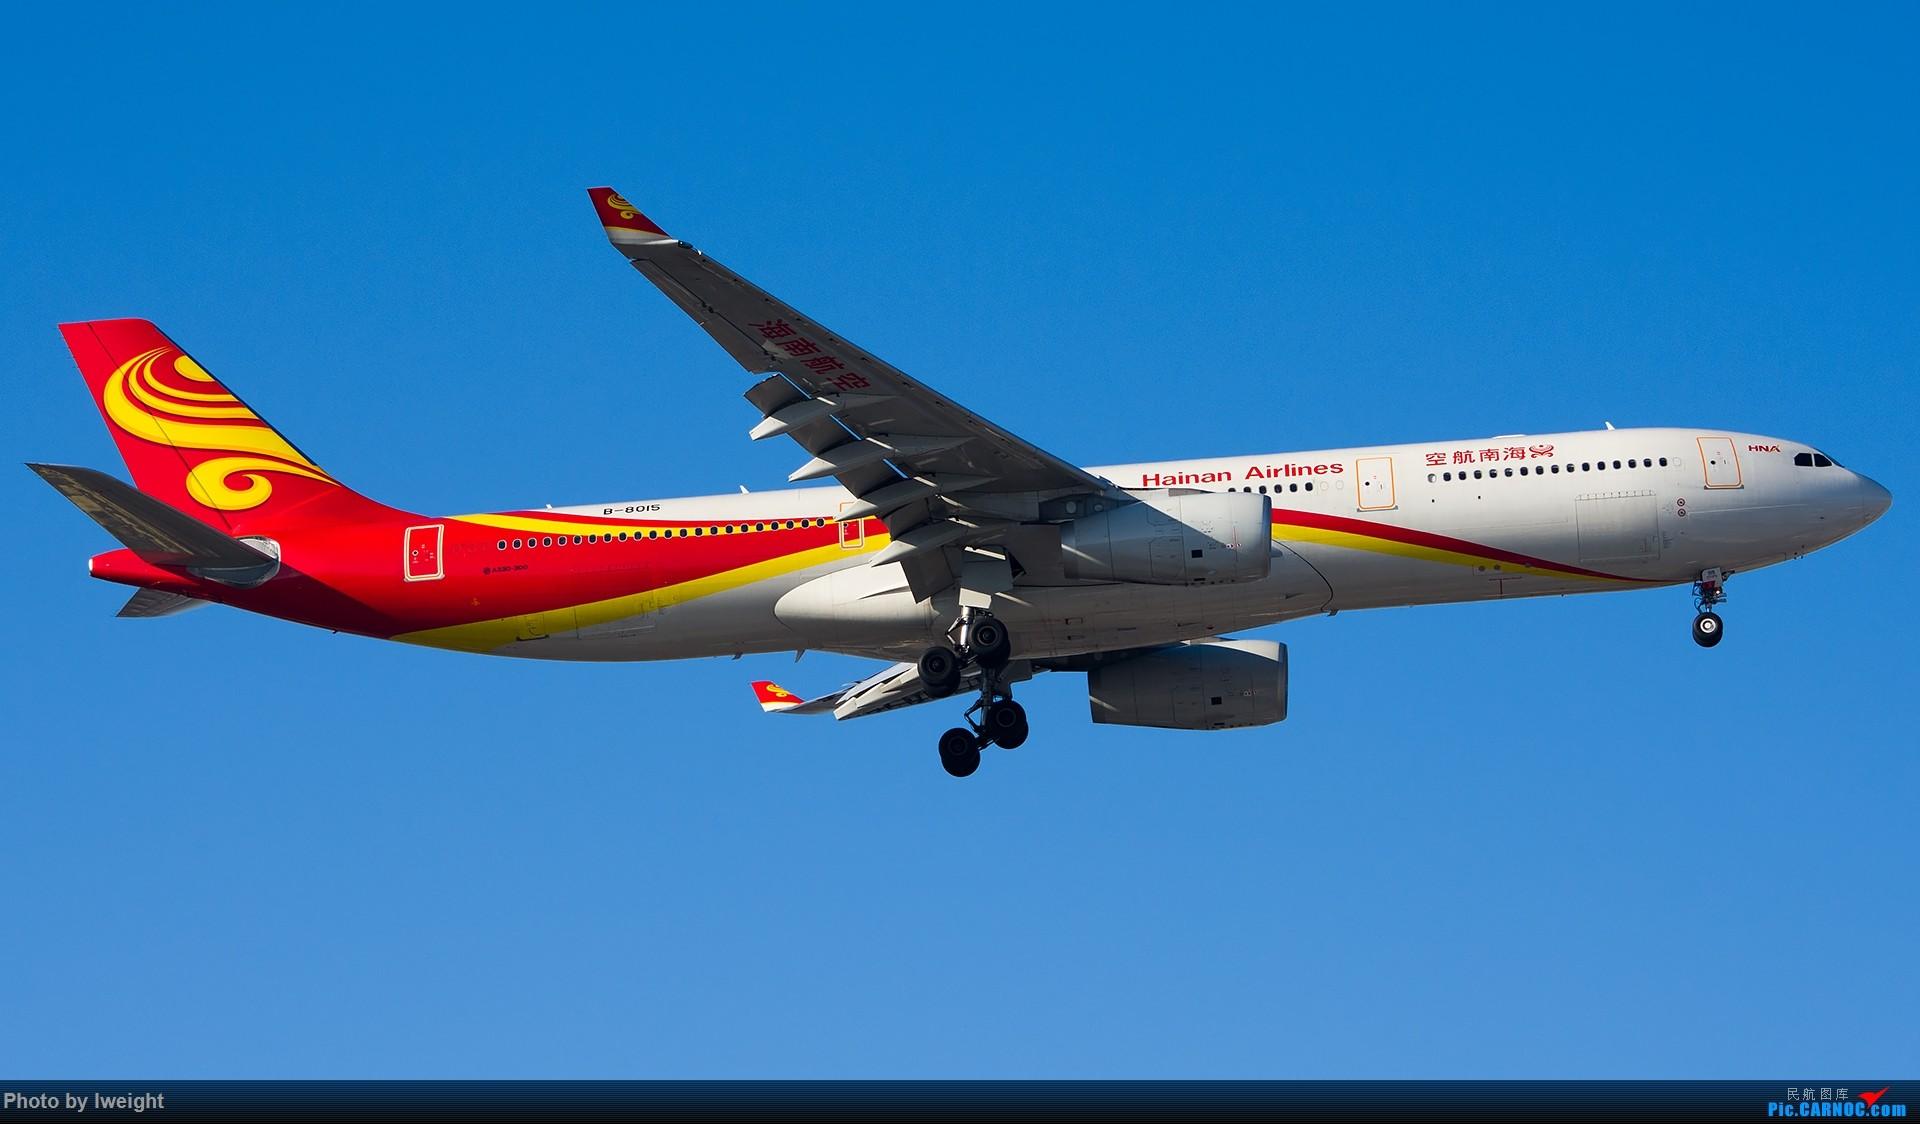 Re:[原创]终于在12月的北京等到了一个晴天的周末,出来拍拍飞机【2015-12-5】 AIRBUS A330-300 B-8015 中国北京首都国际机场